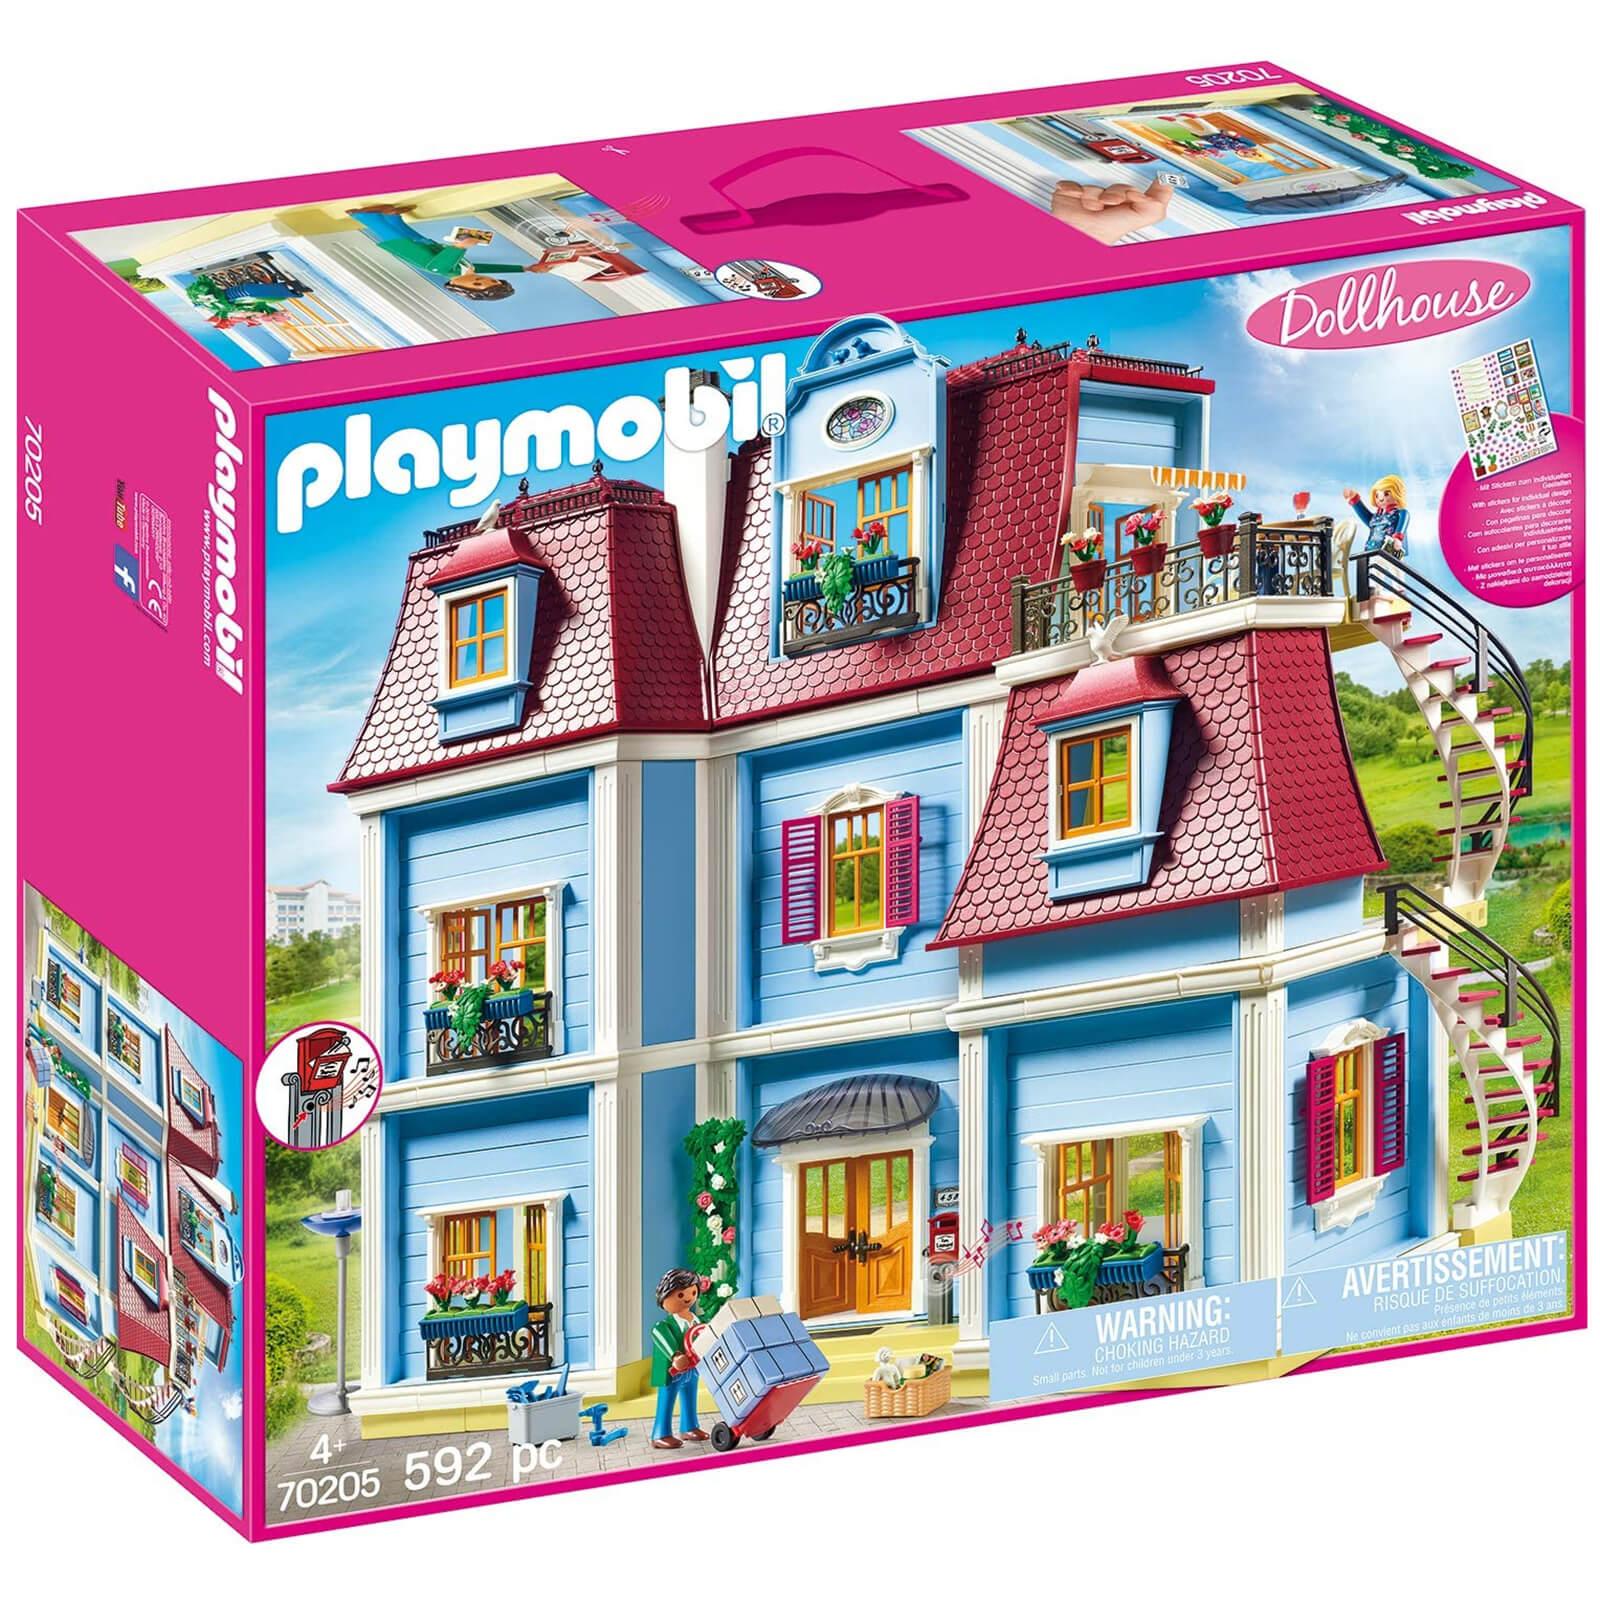 Image of Playmobil Dollhouse Large Dollhouse (70205)